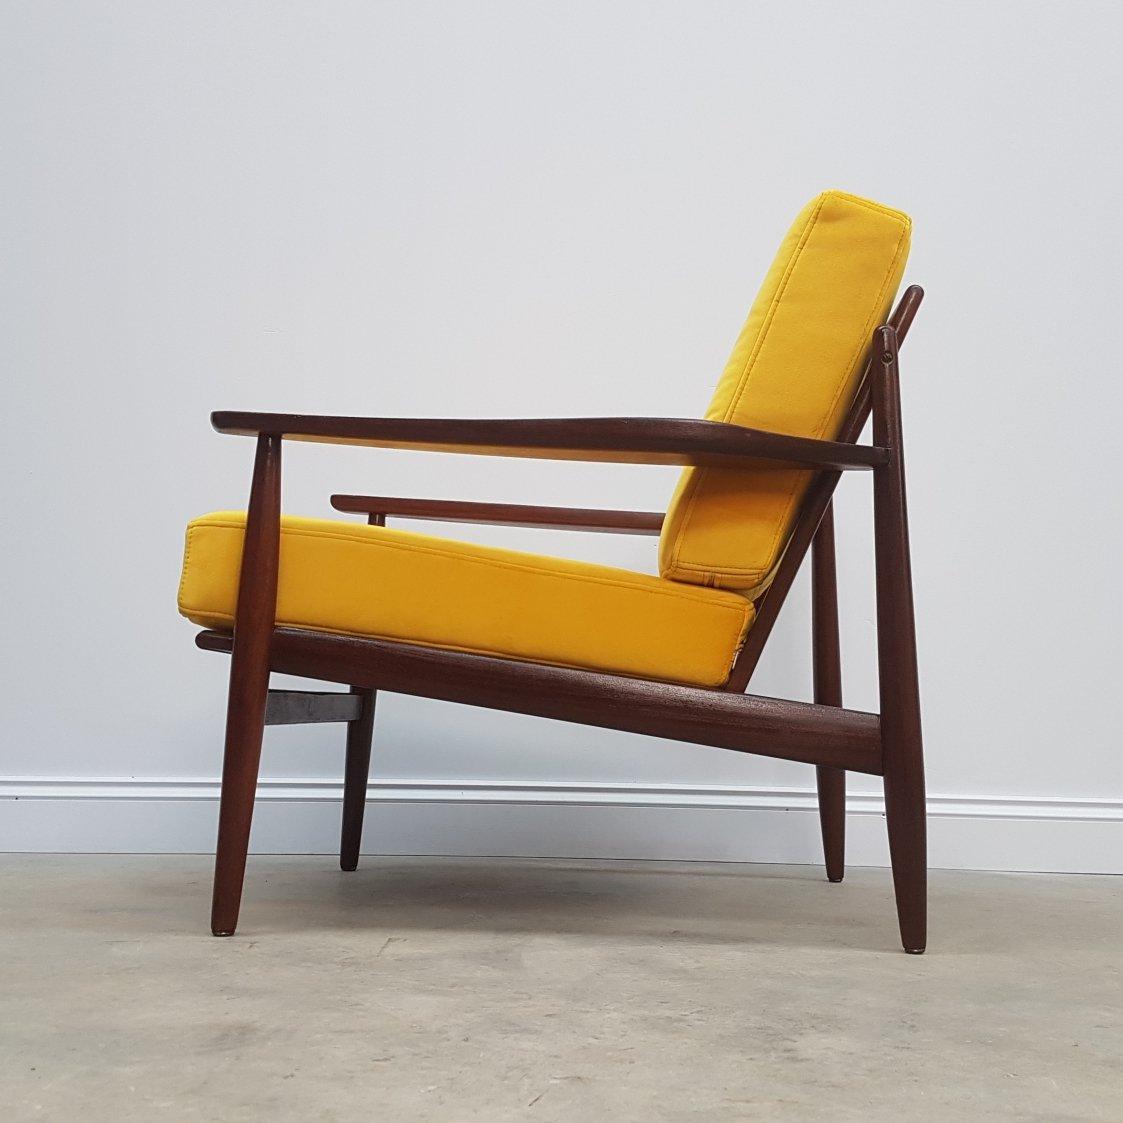 1960 S Danish Lounger Club Chair In Golden Yellow Luxury Velvet 124229